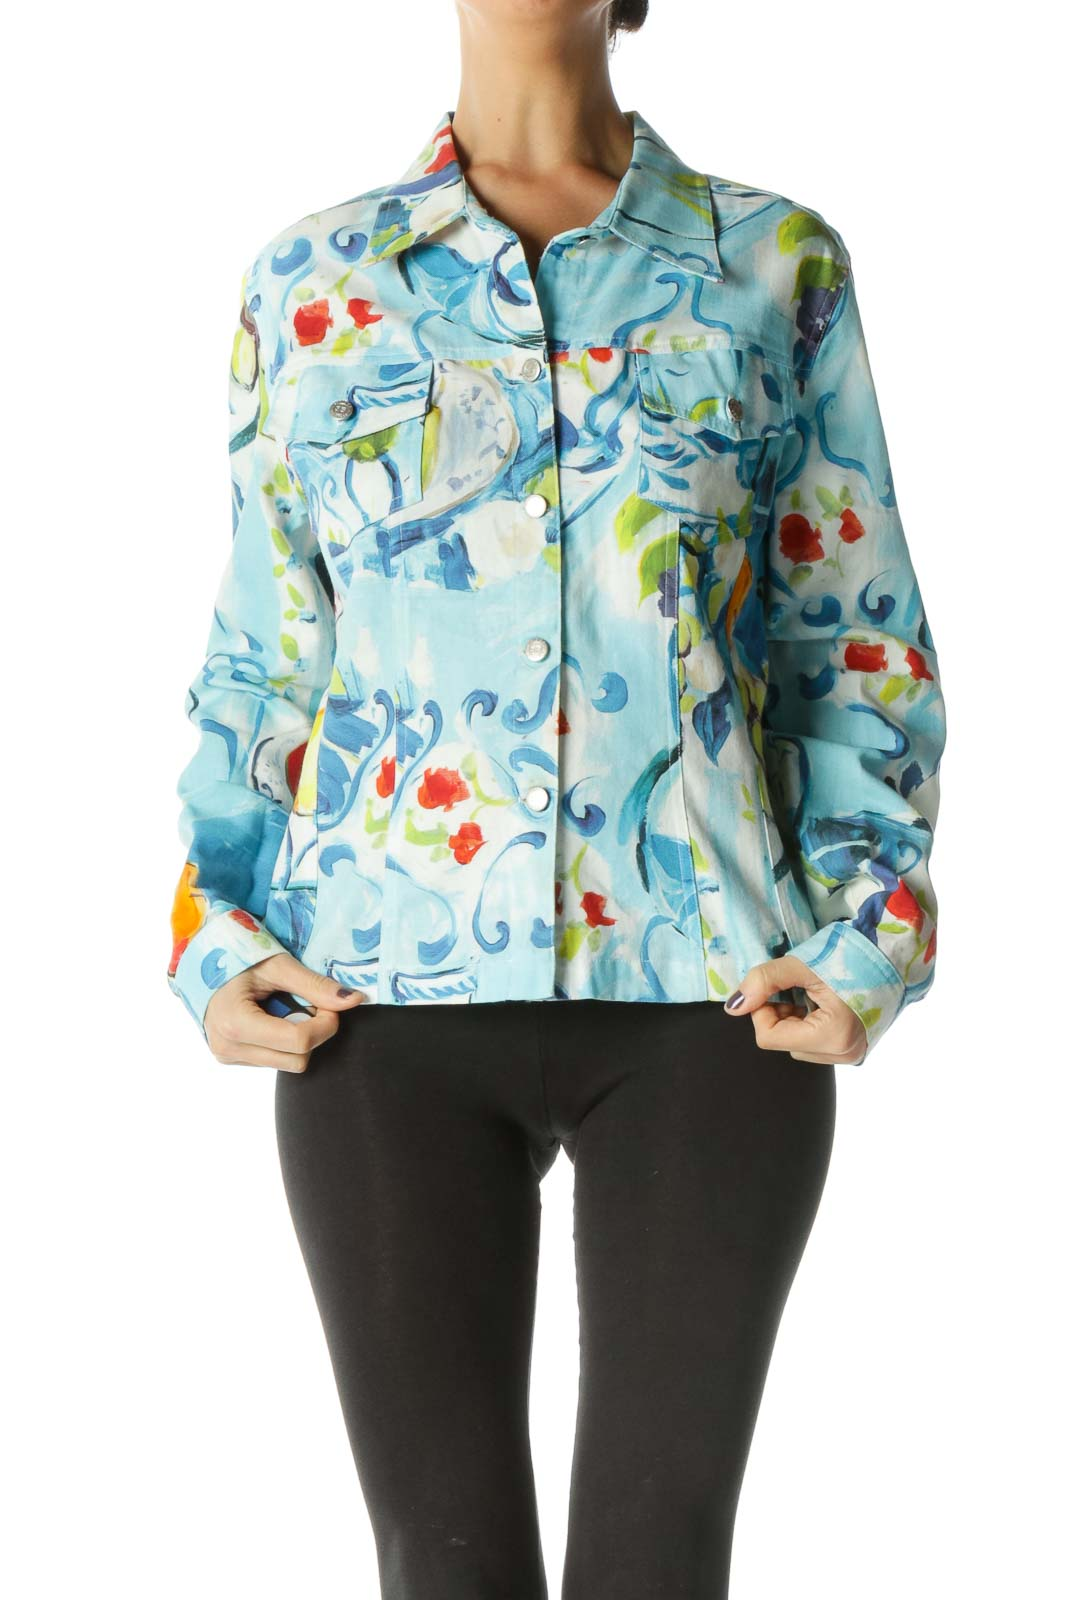 Blue Long Sleeve Jacket Front